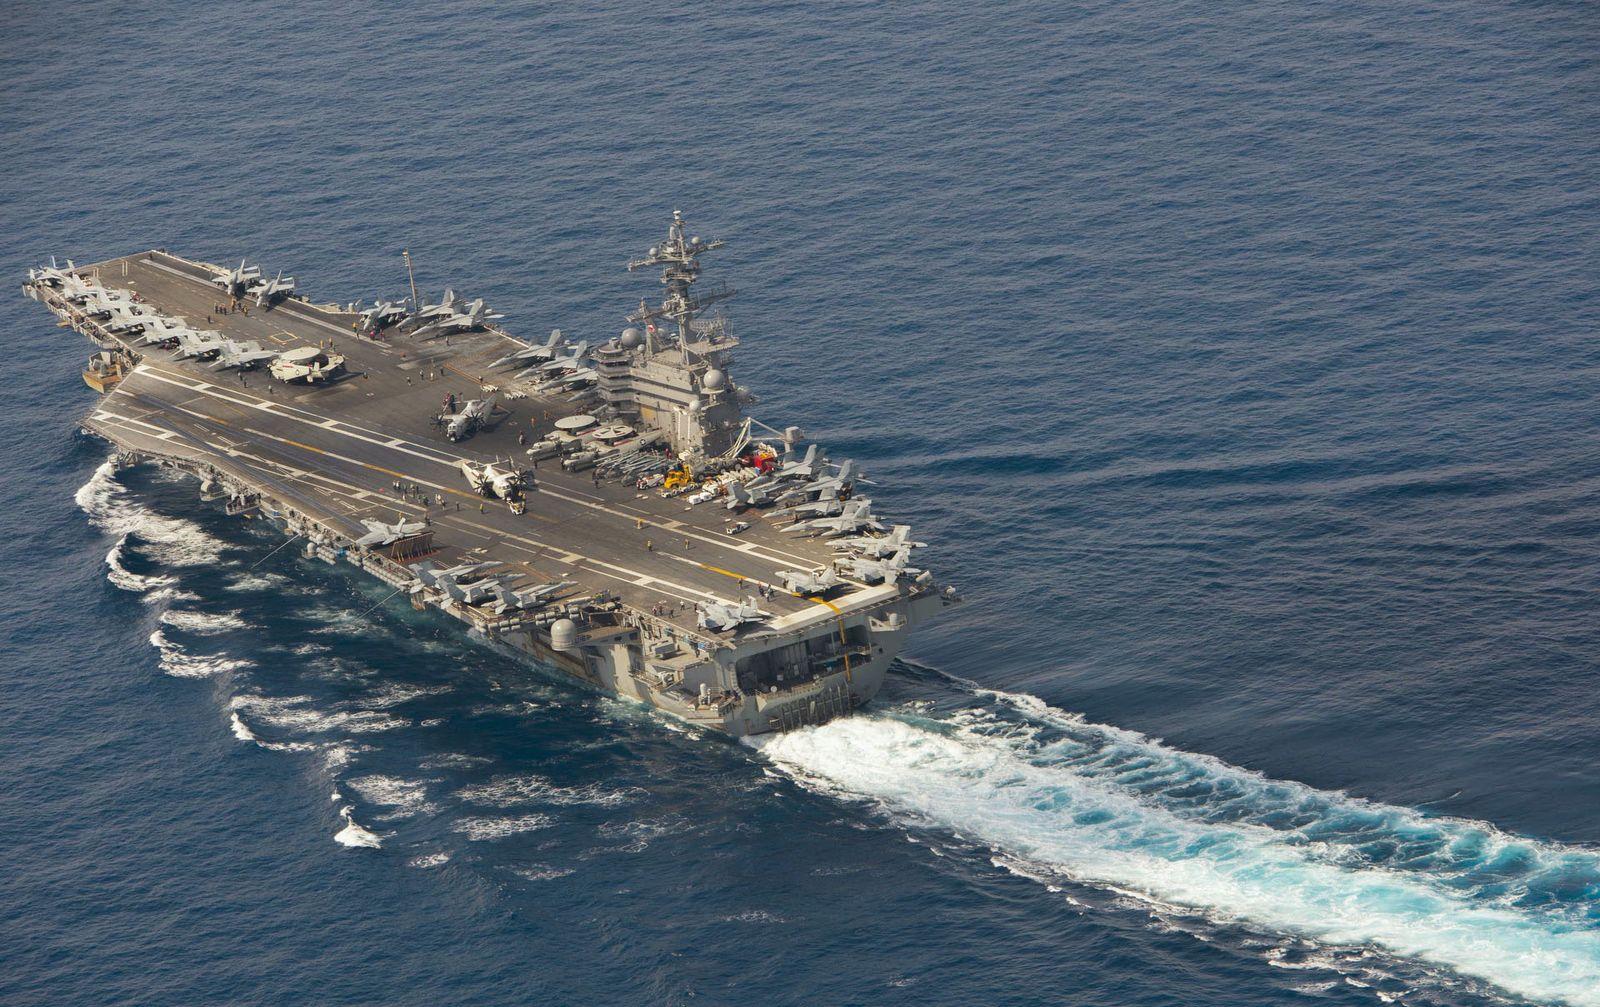 Flugzeugträger / GHWB / Carrier Strike Group (CSG)